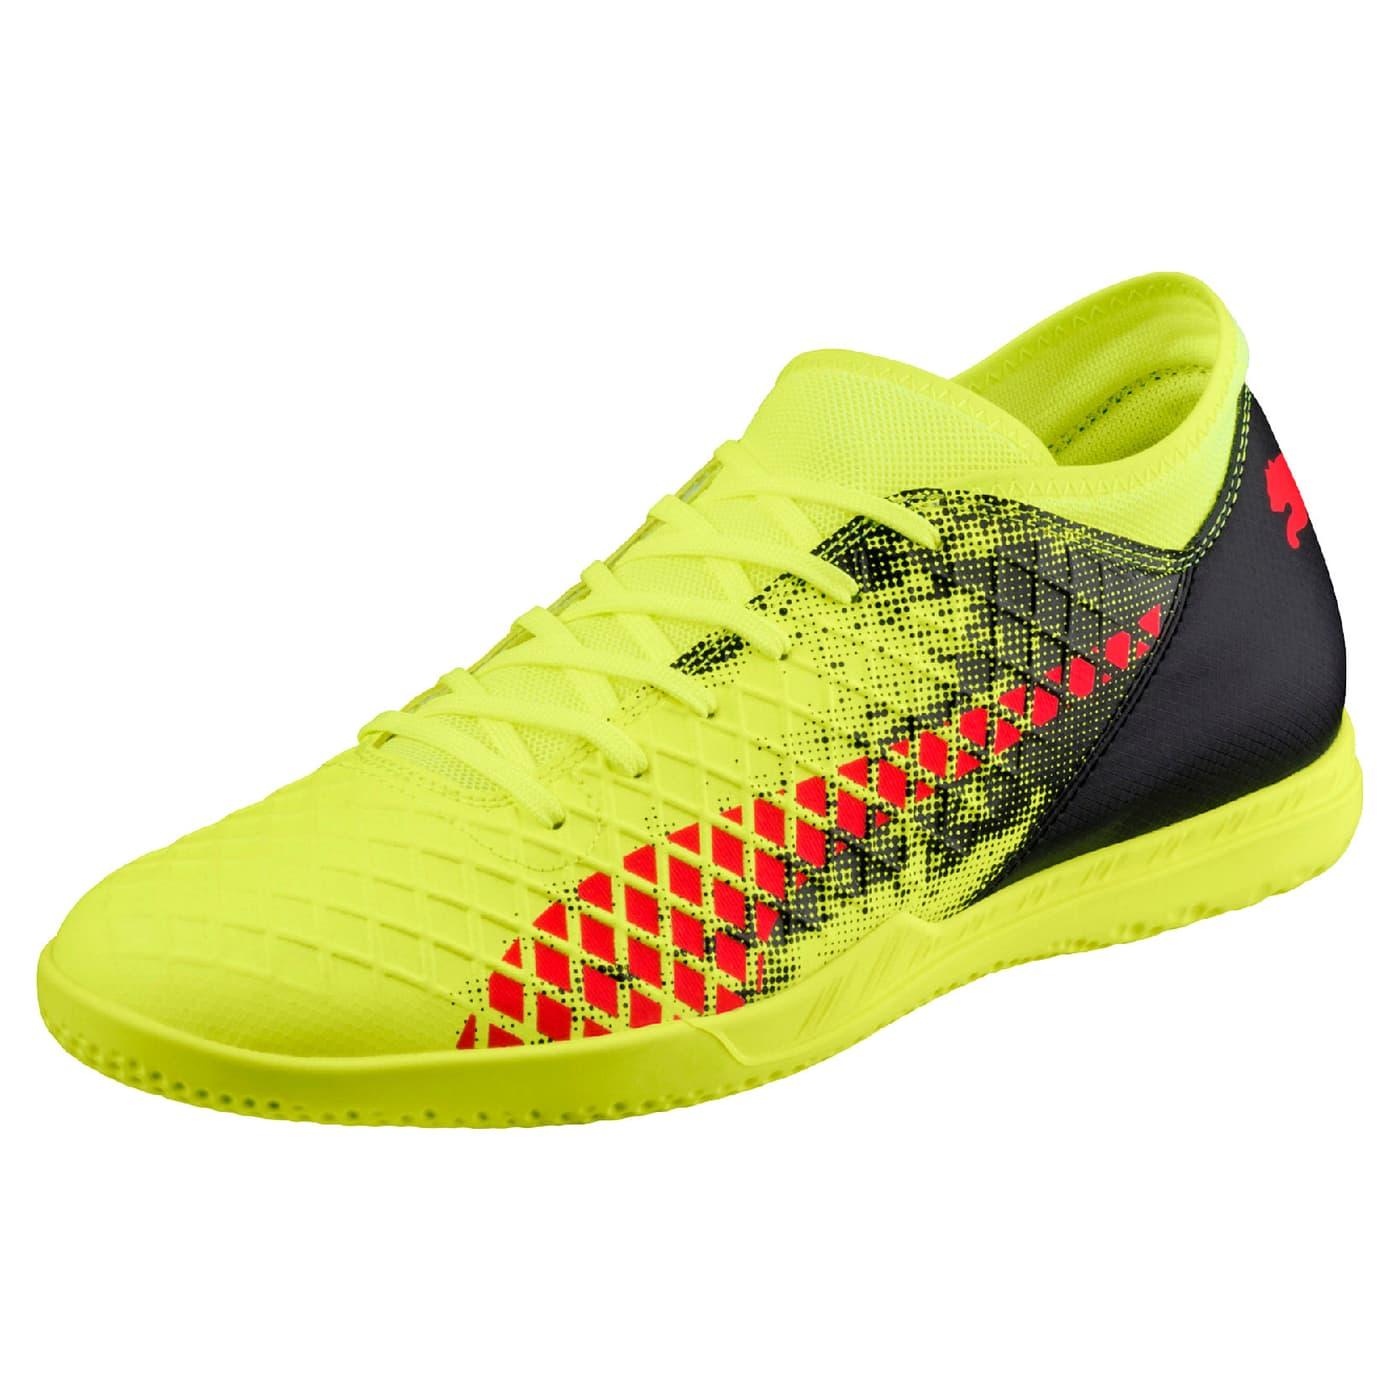 Homme Pour 18 Chaussures Puma 4 De Future It Football 76bYyIfgvm